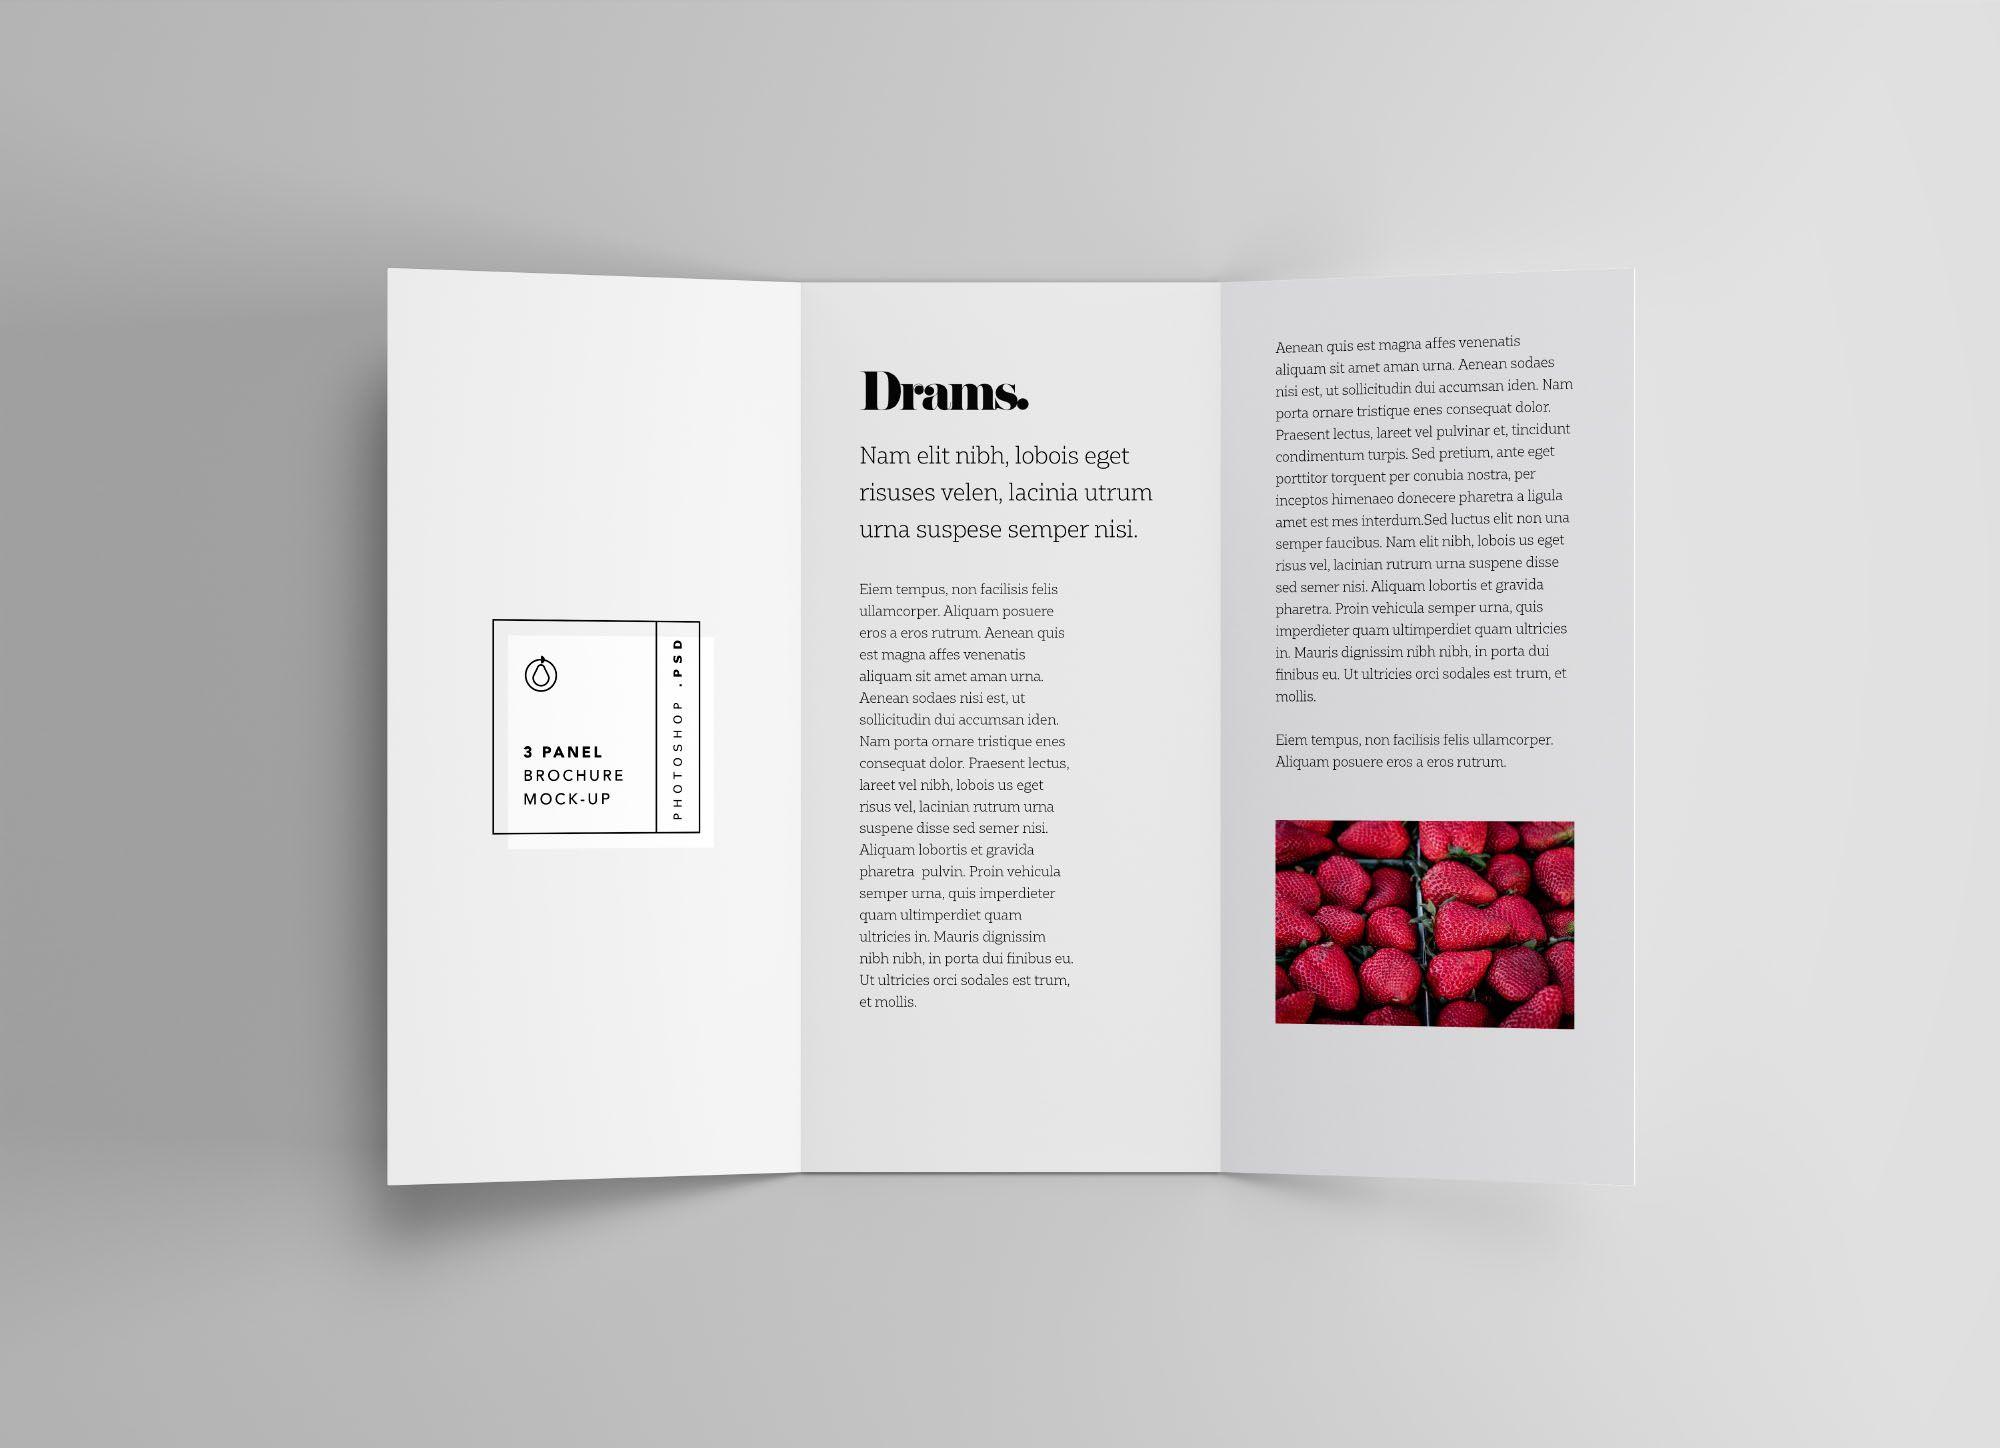 3 Panel Brochure Mockup Brochure Brochures Mockups Brochure Design